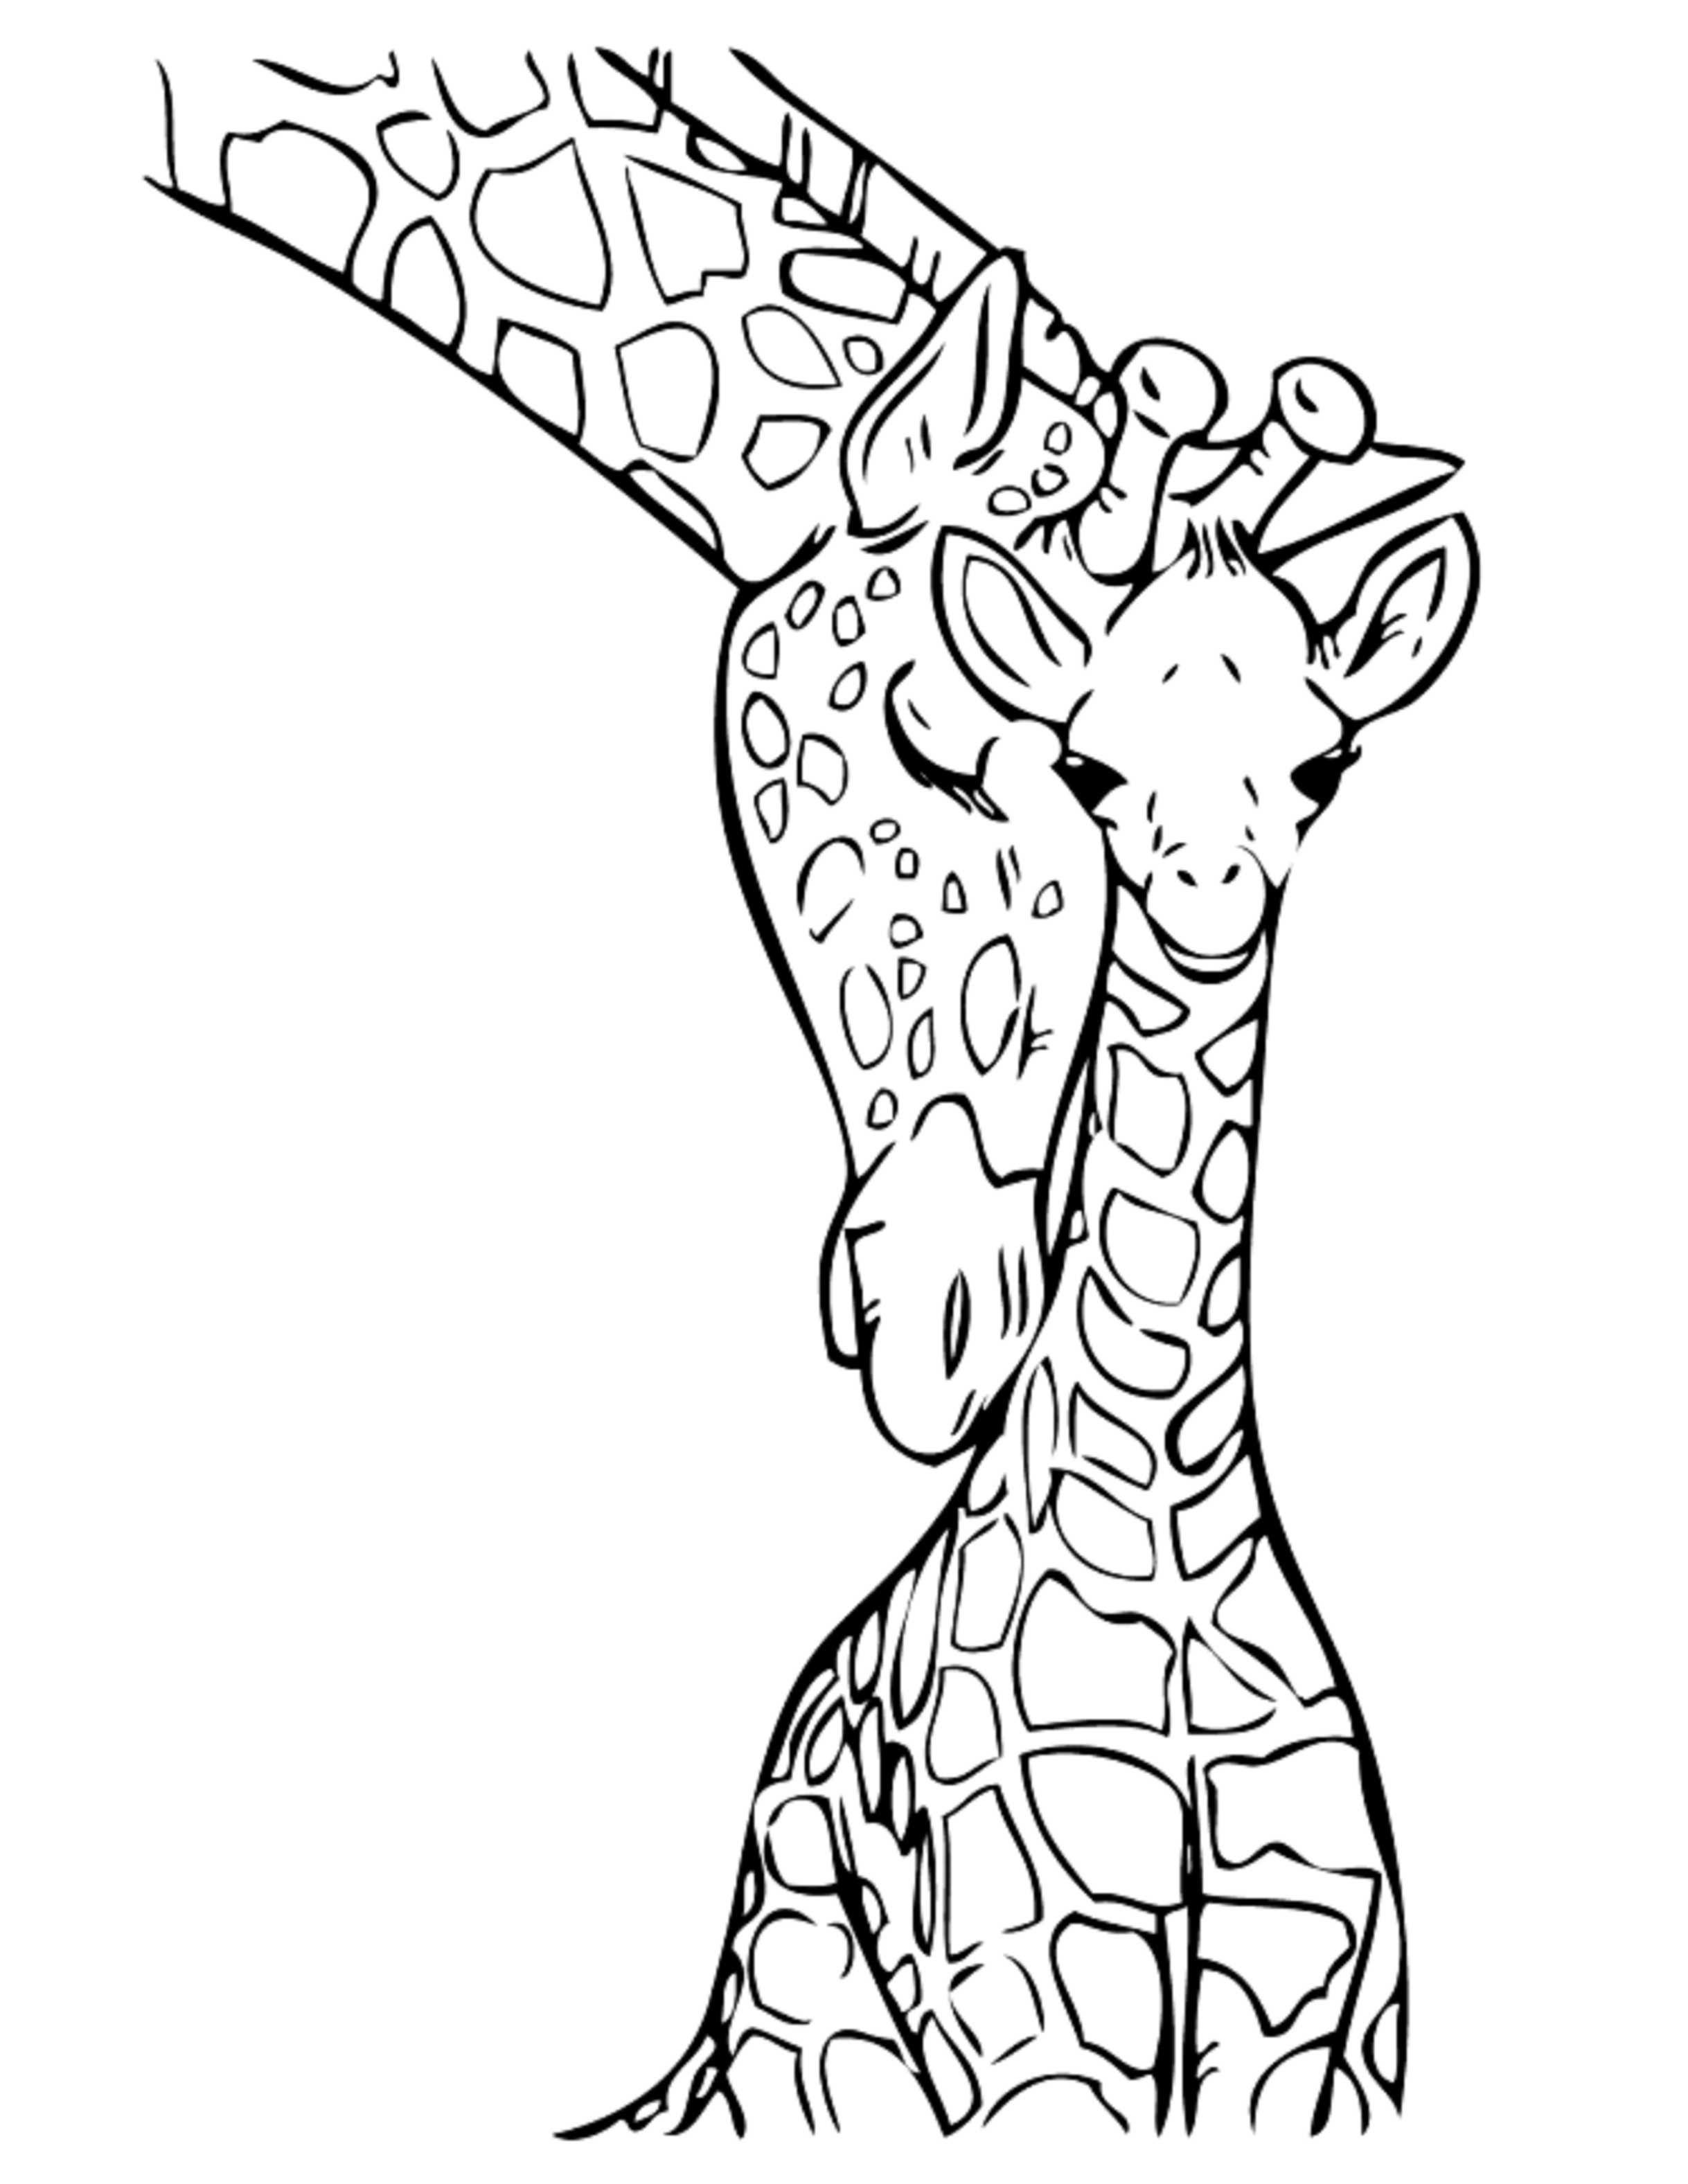 2437x3154 giraffe drawing abstract and giraffe coloring pages giraffe